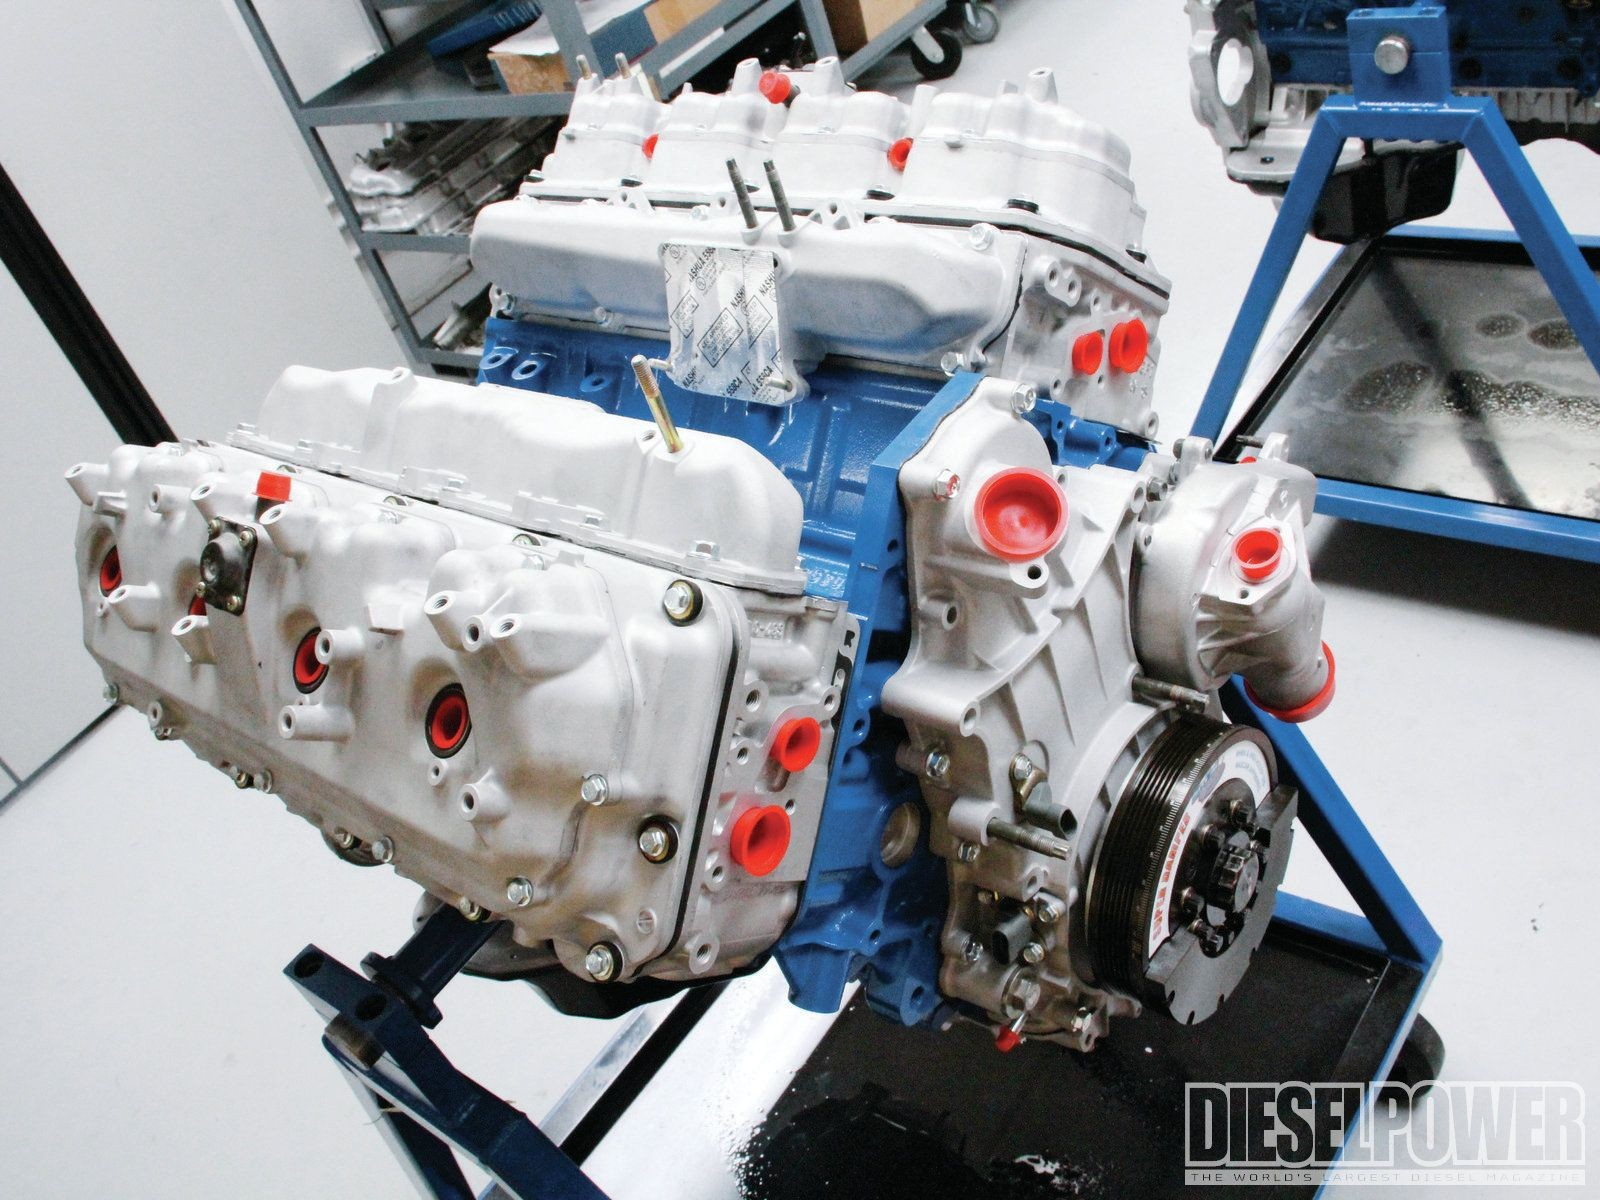 Duramax Diesel Engine Diagram Million Mile Duramax Engine Rebuild & Image Gallery Of Duramax Diesel Engine Diagram